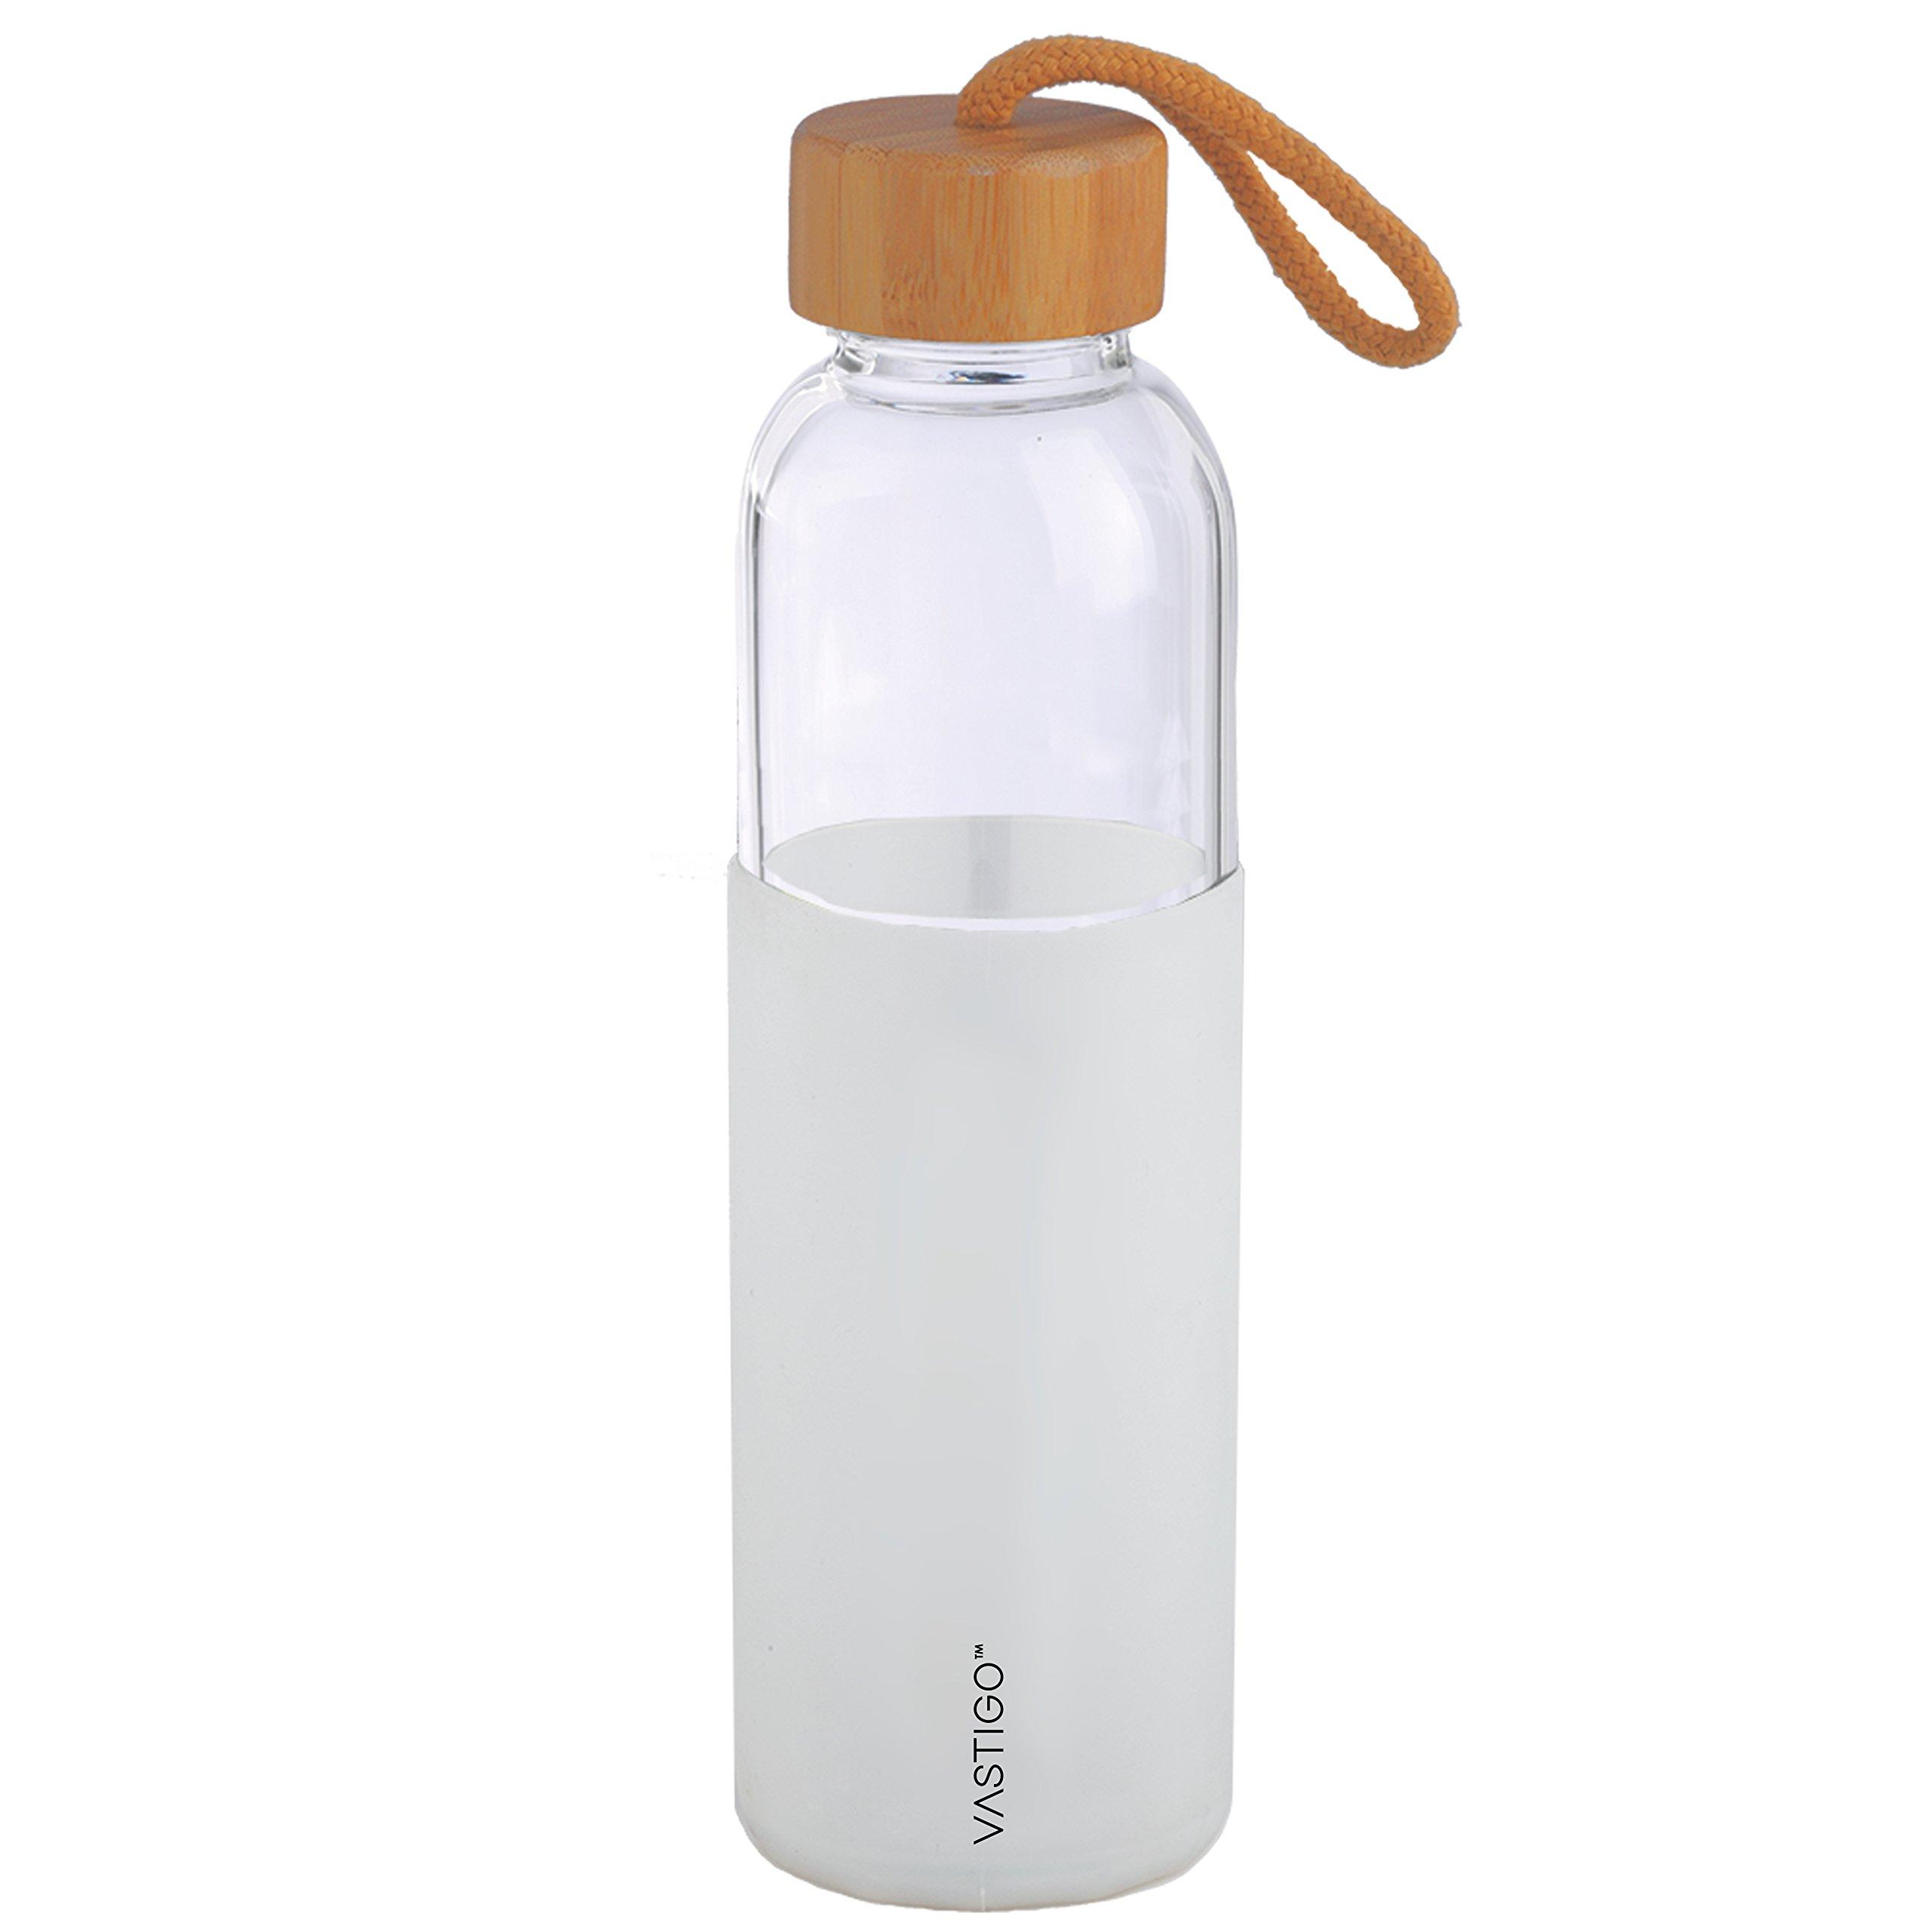 Vastigo 18 oz Borosilicate Glass Bottle Sleek Design w/White Silicone Sleeve, Bamboo Lid, and Rope Handle   Eco Friendly